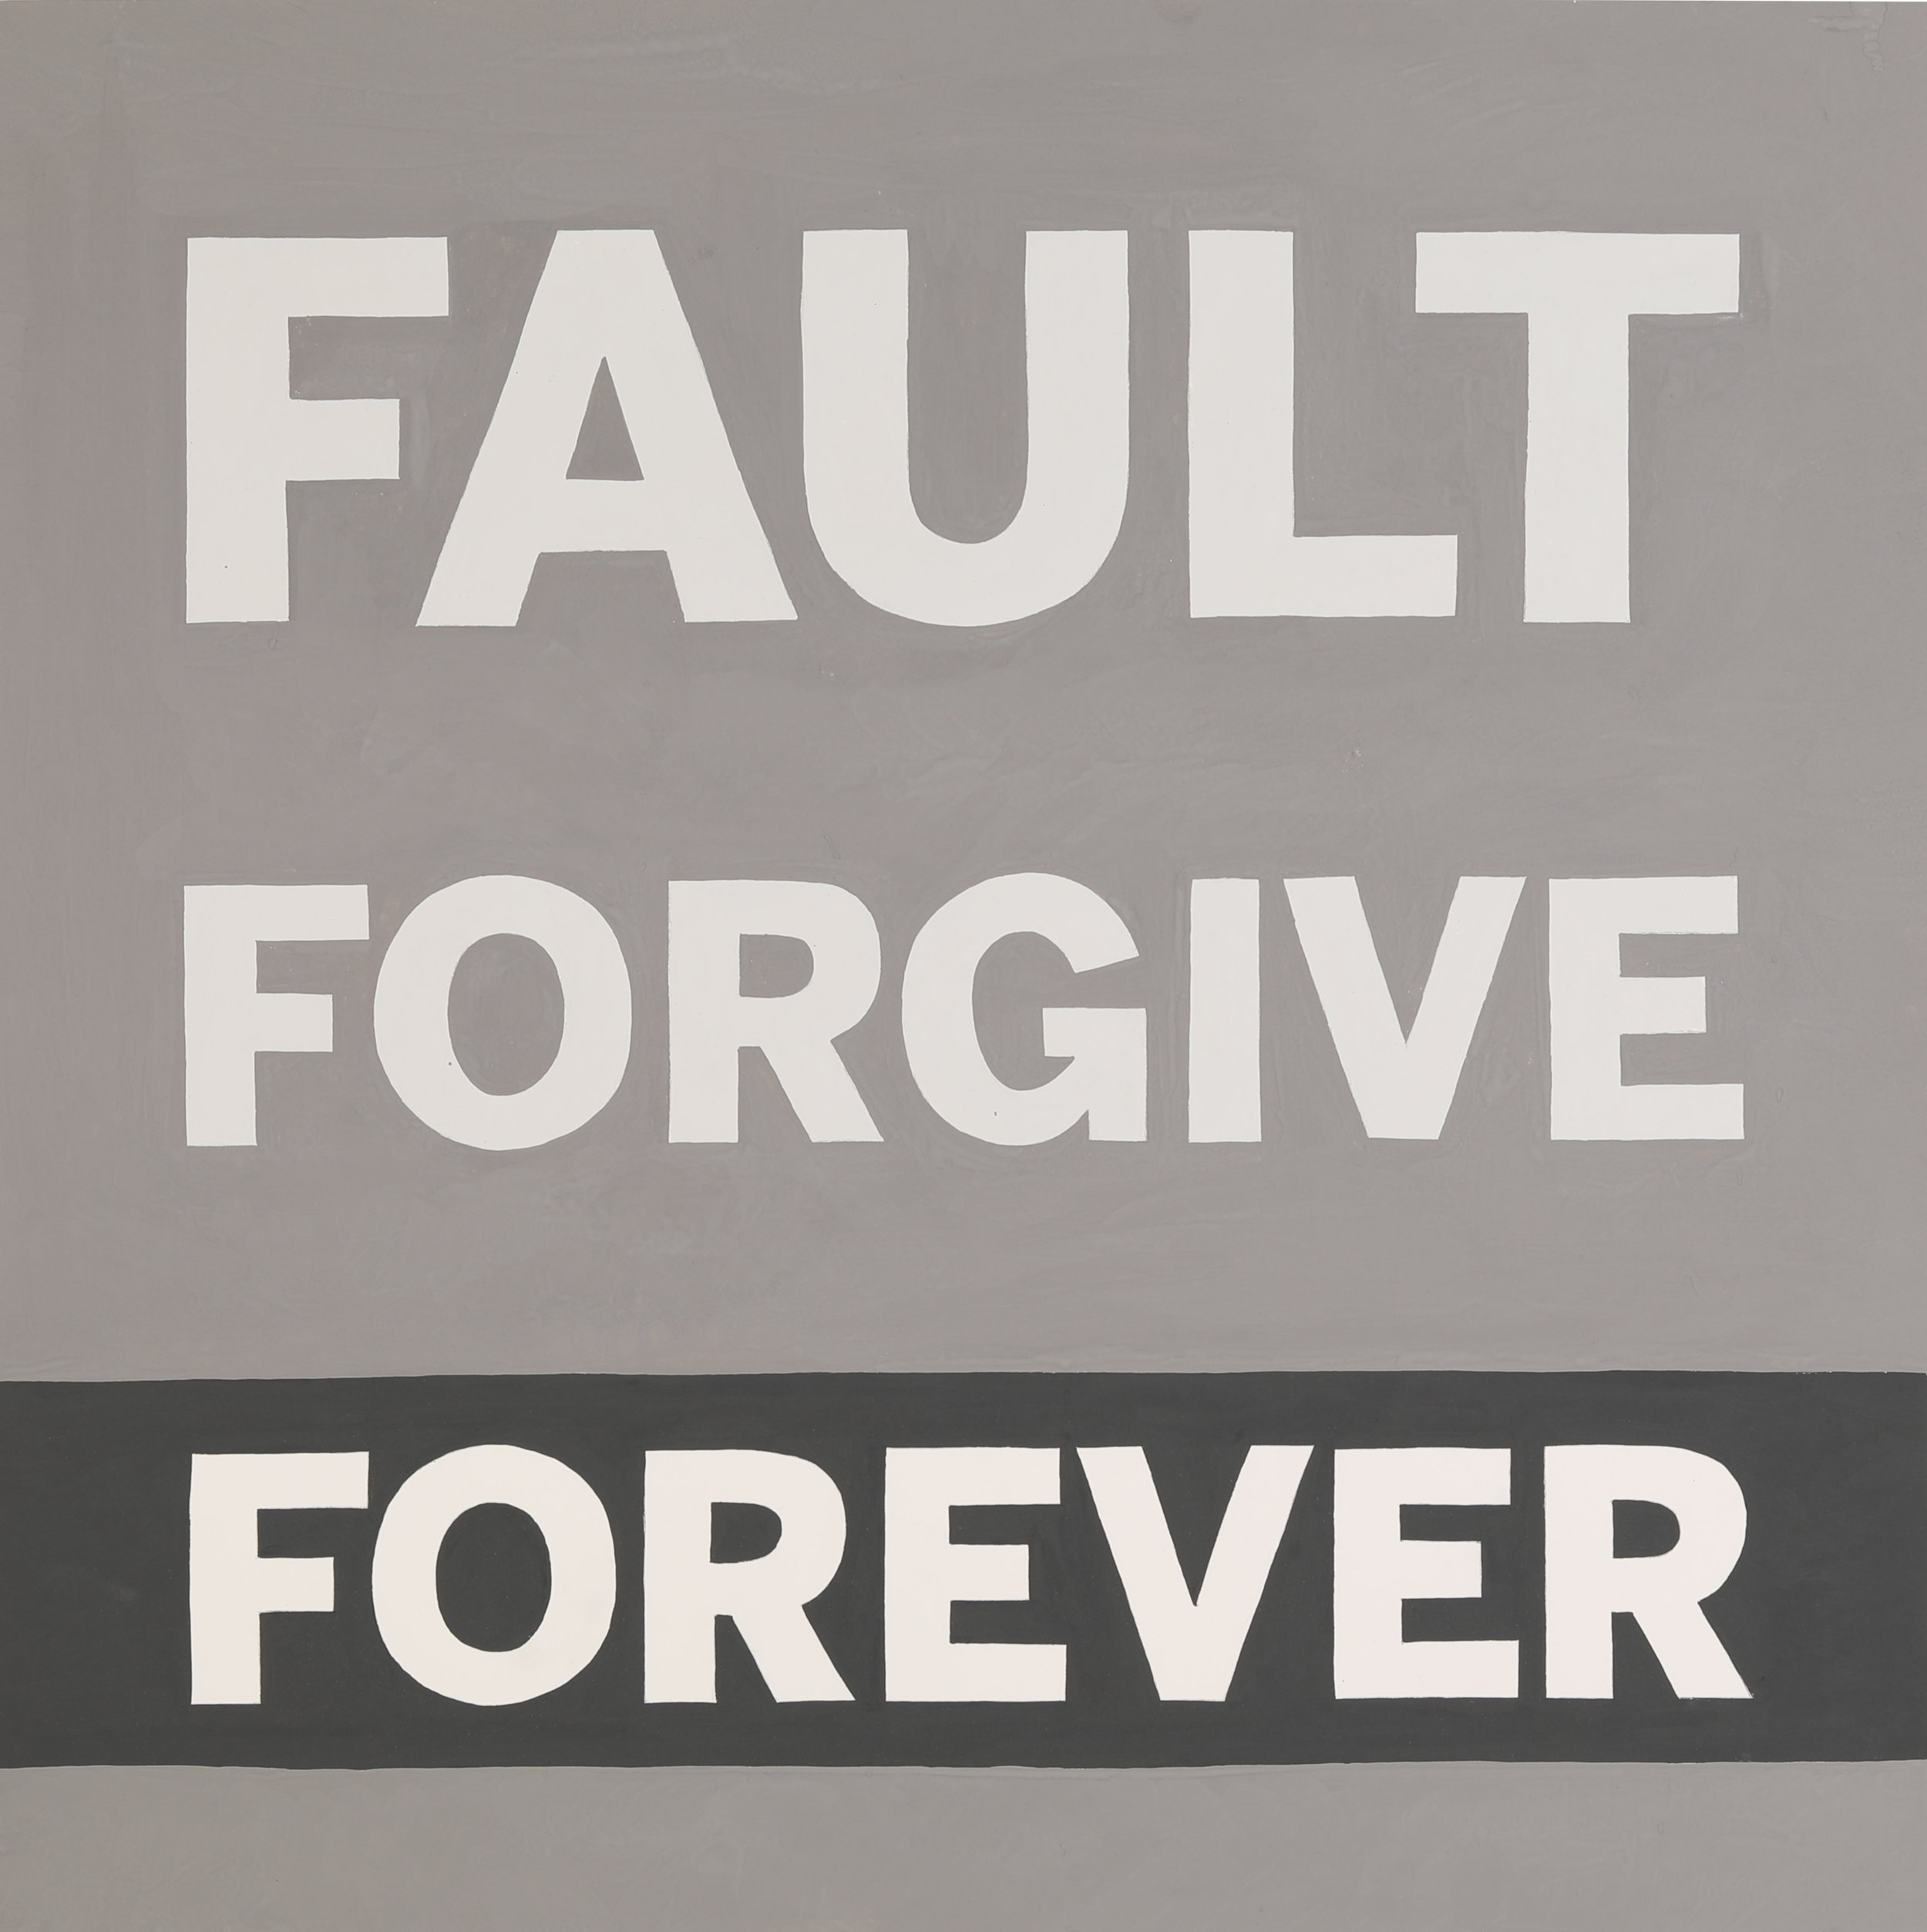 FAULT FORGIVE FOREVER